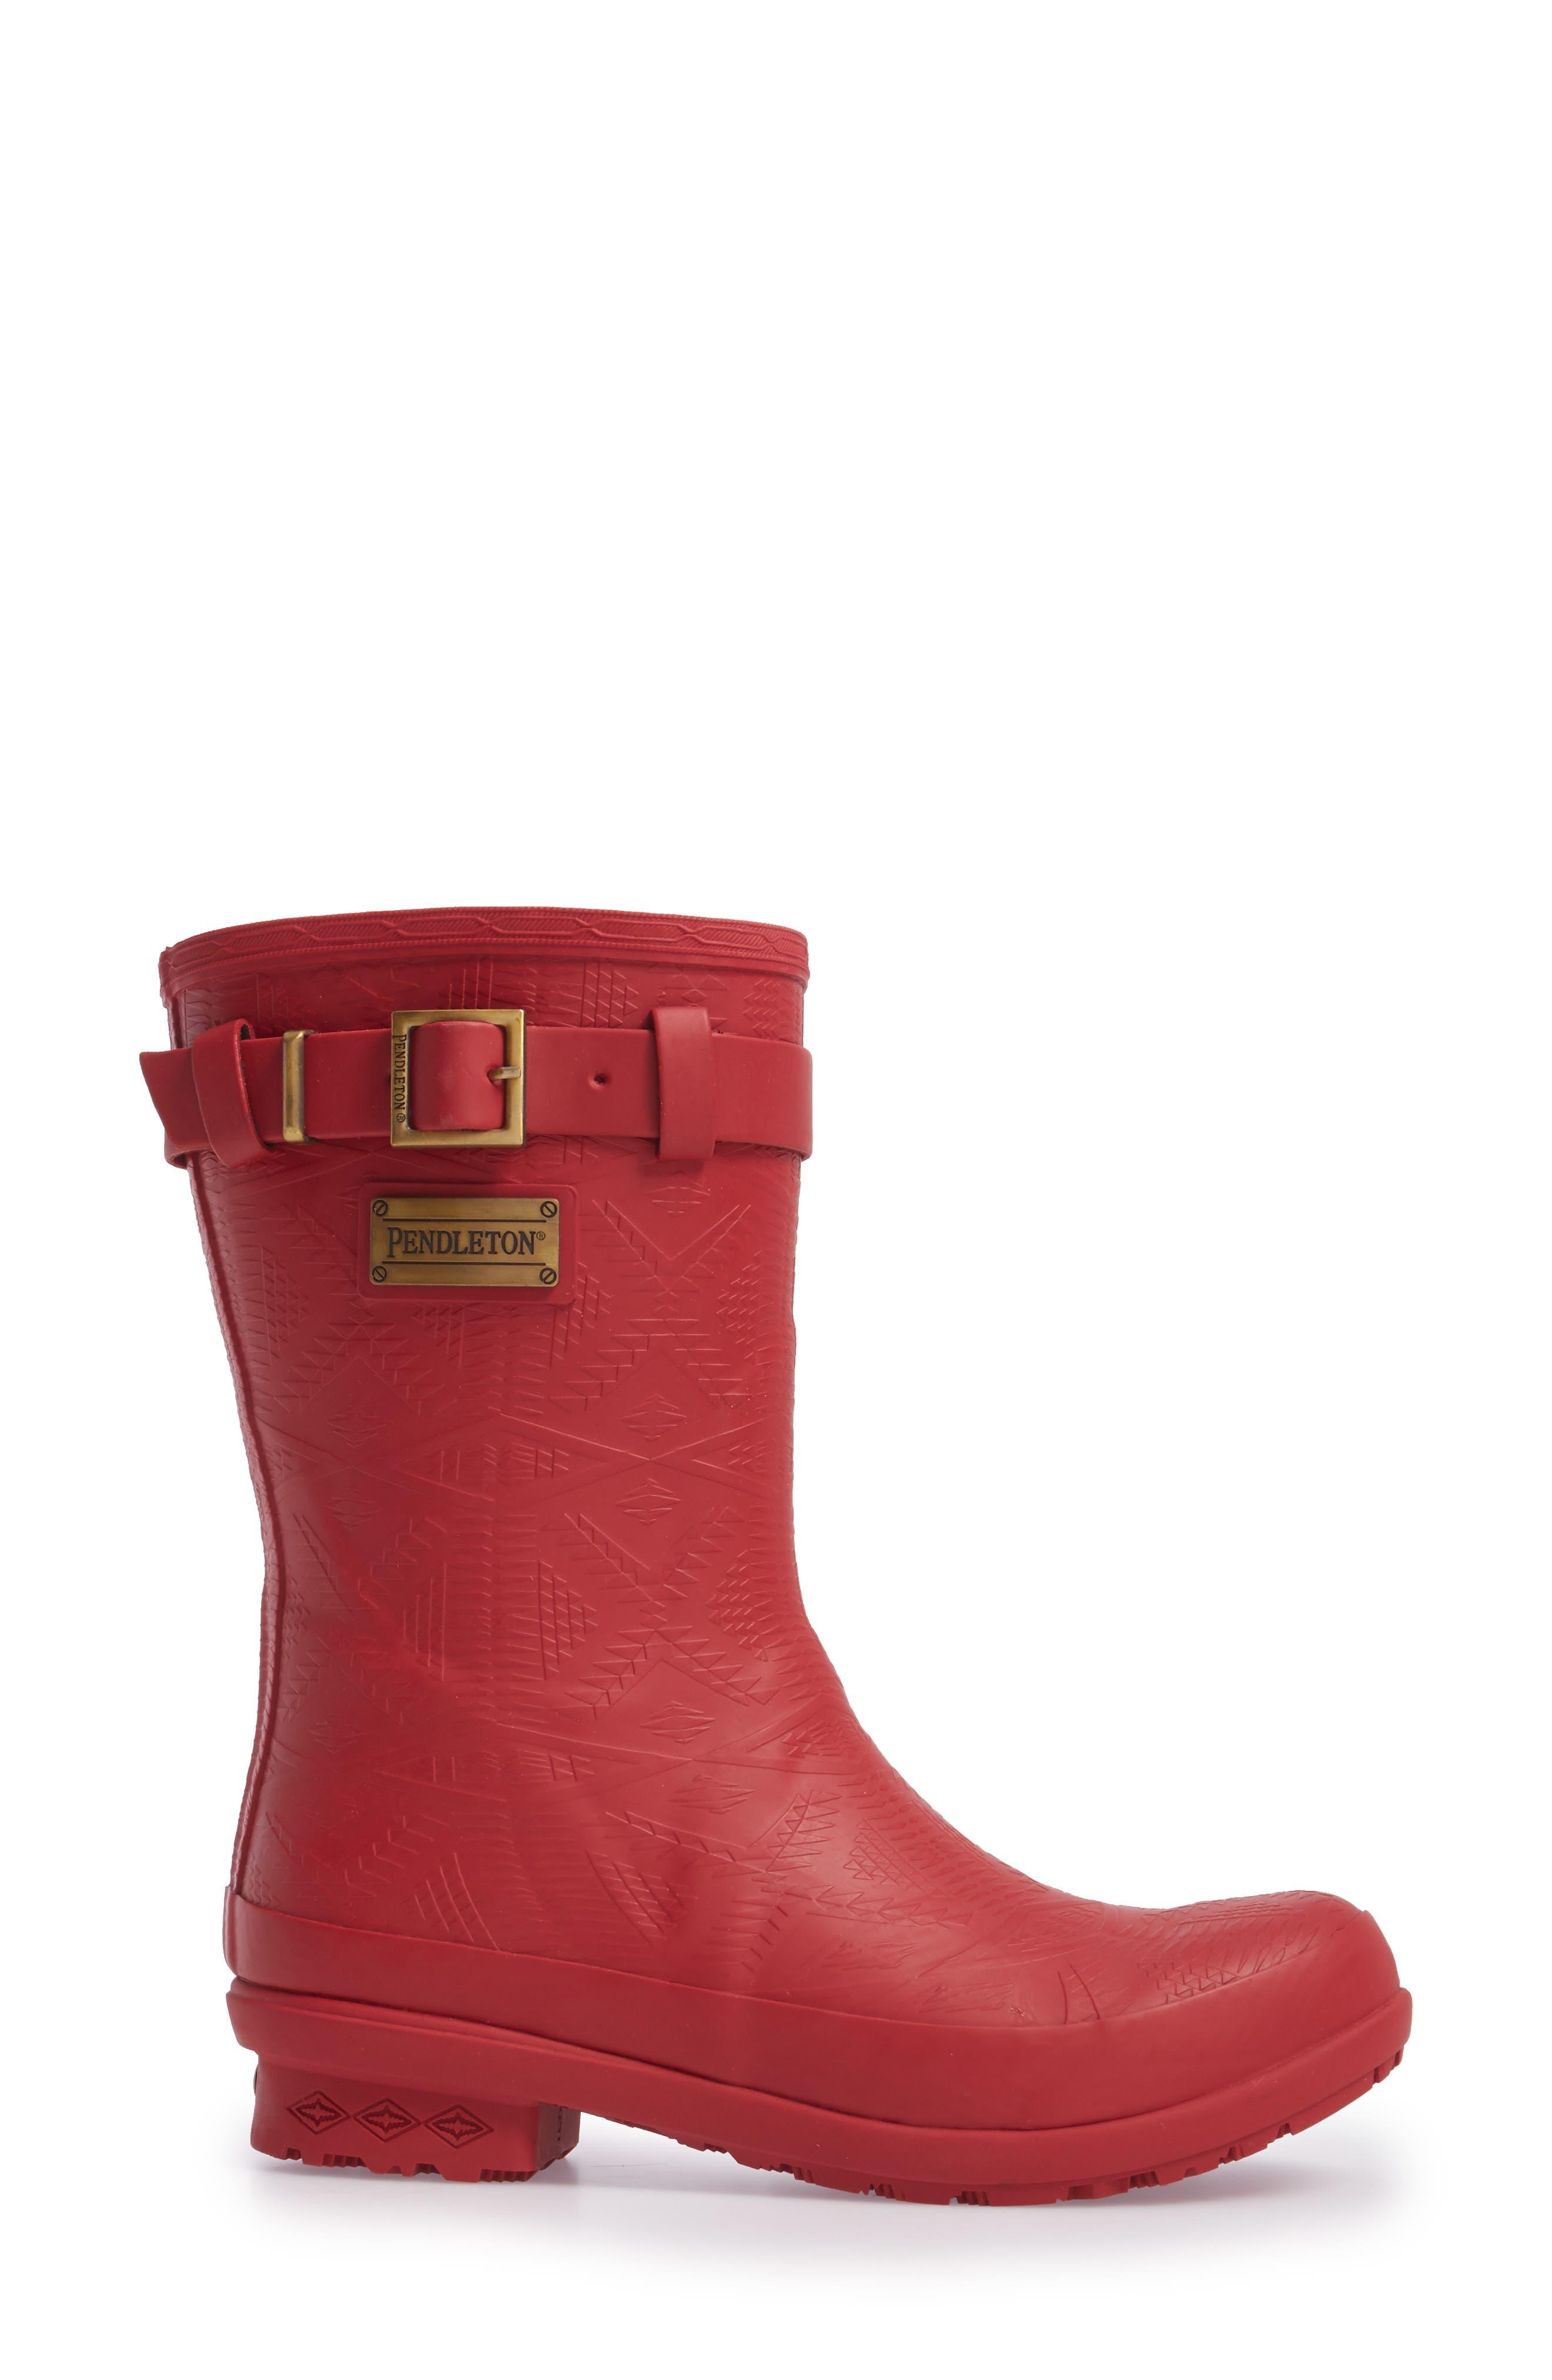 Pendleton Embossed Short Rain Boot,                             Alternate thumbnail 3, color,                             Scarlet